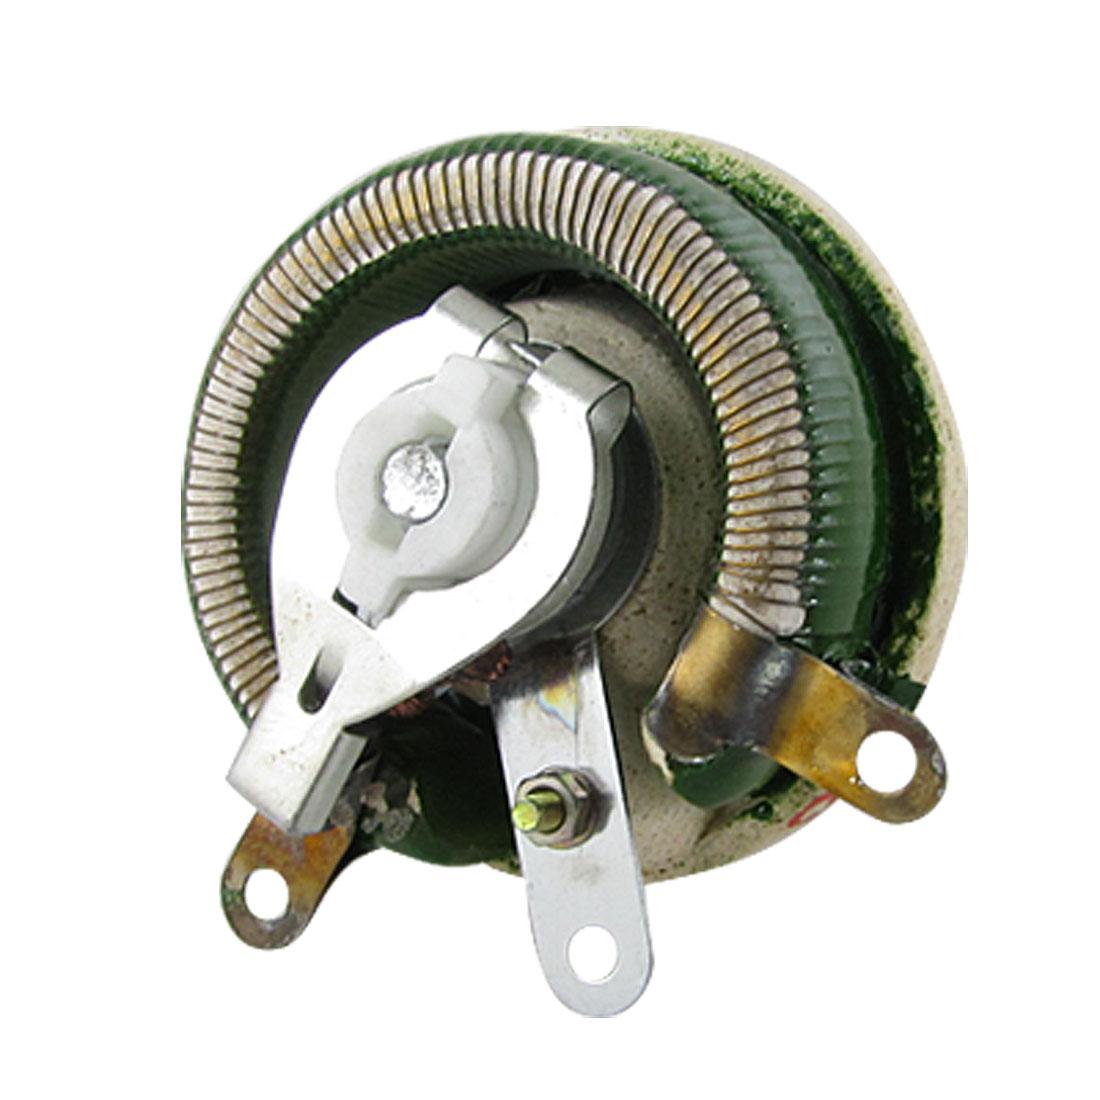 "50W 50 Ohm Rotary Adjustable Resistor Rheostat 1 3/5"" Shaft - image 1 of 1"